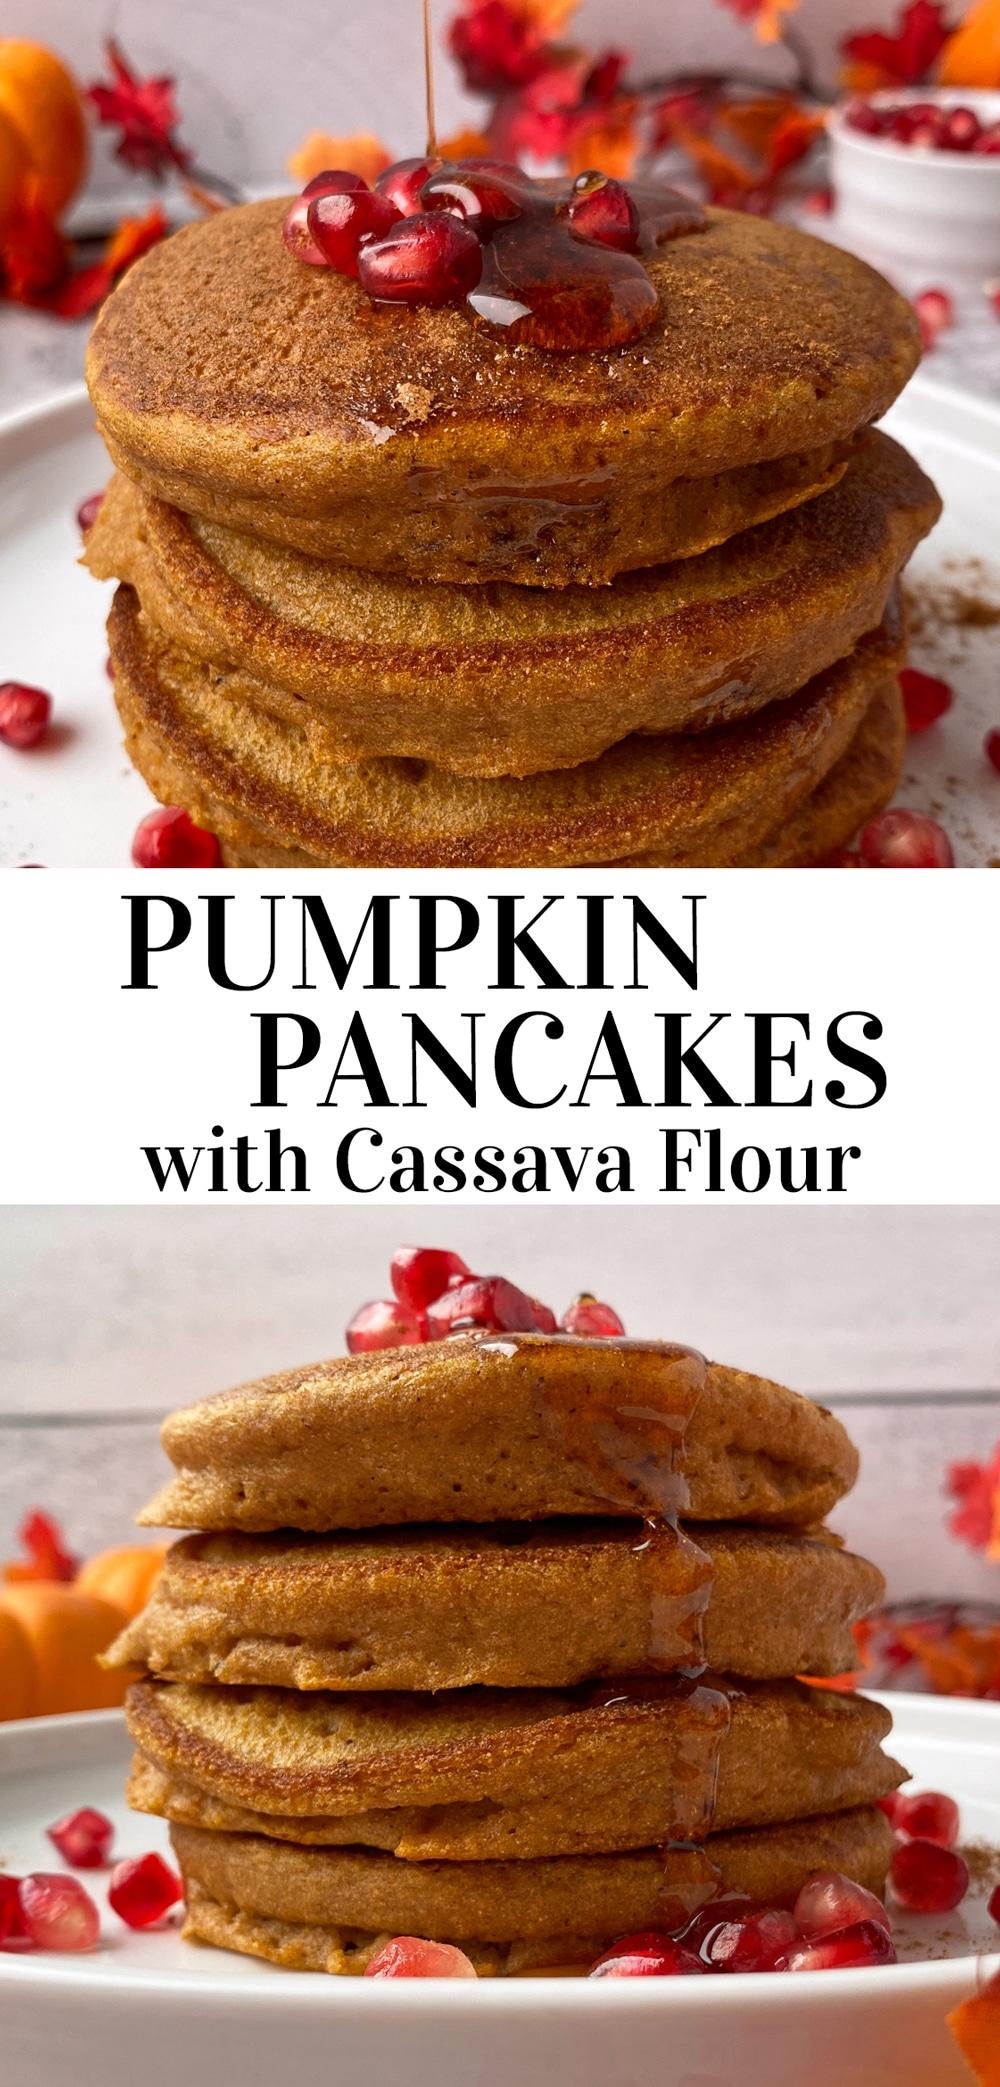 Paleo-Pumpkin-Pancakes-with-Cassava-Flour